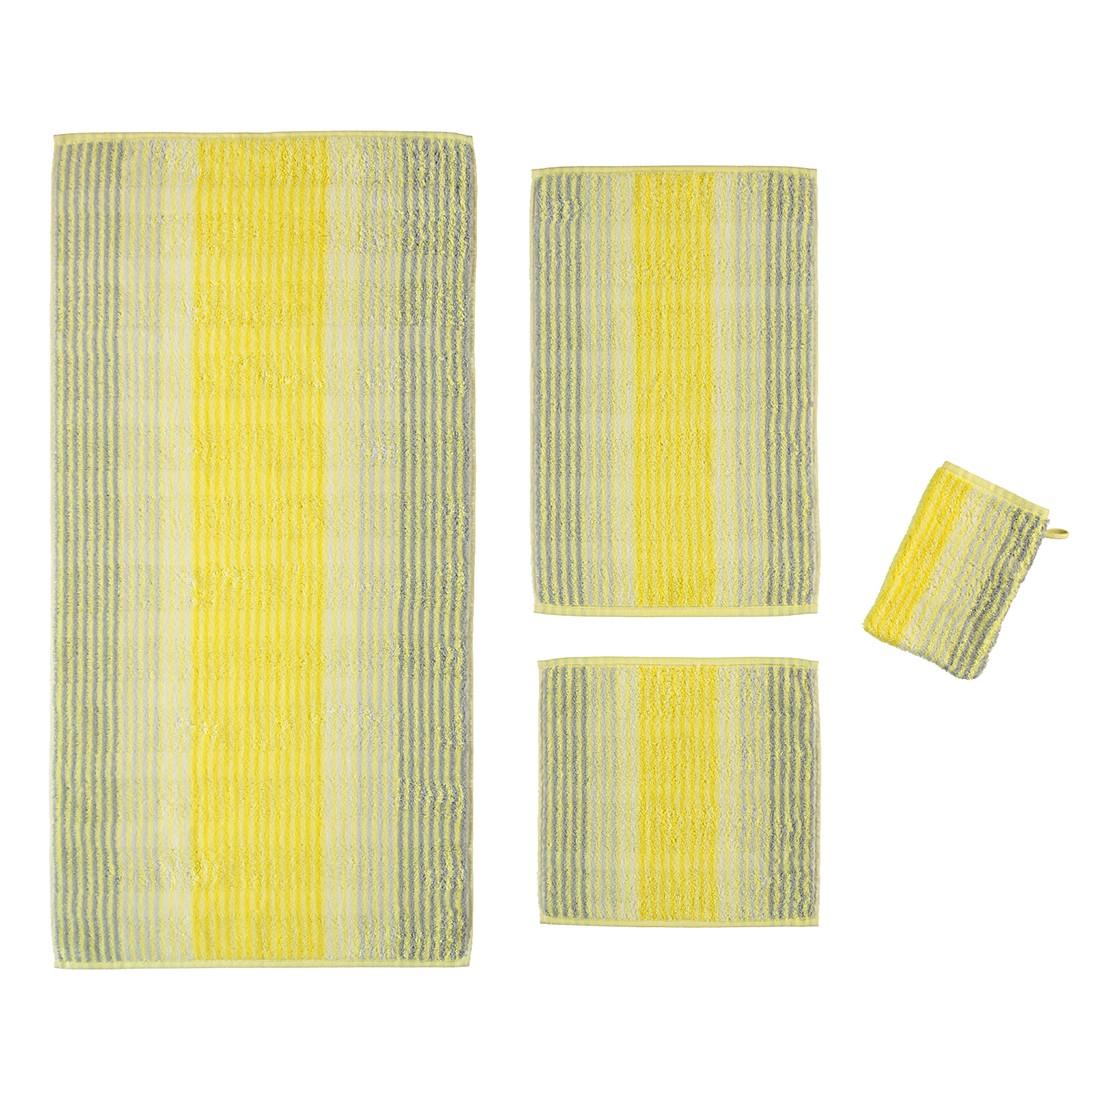 handt cher noblesse cashmere streifen 1056 baumwolle. Black Bedroom Furniture Sets. Home Design Ideas